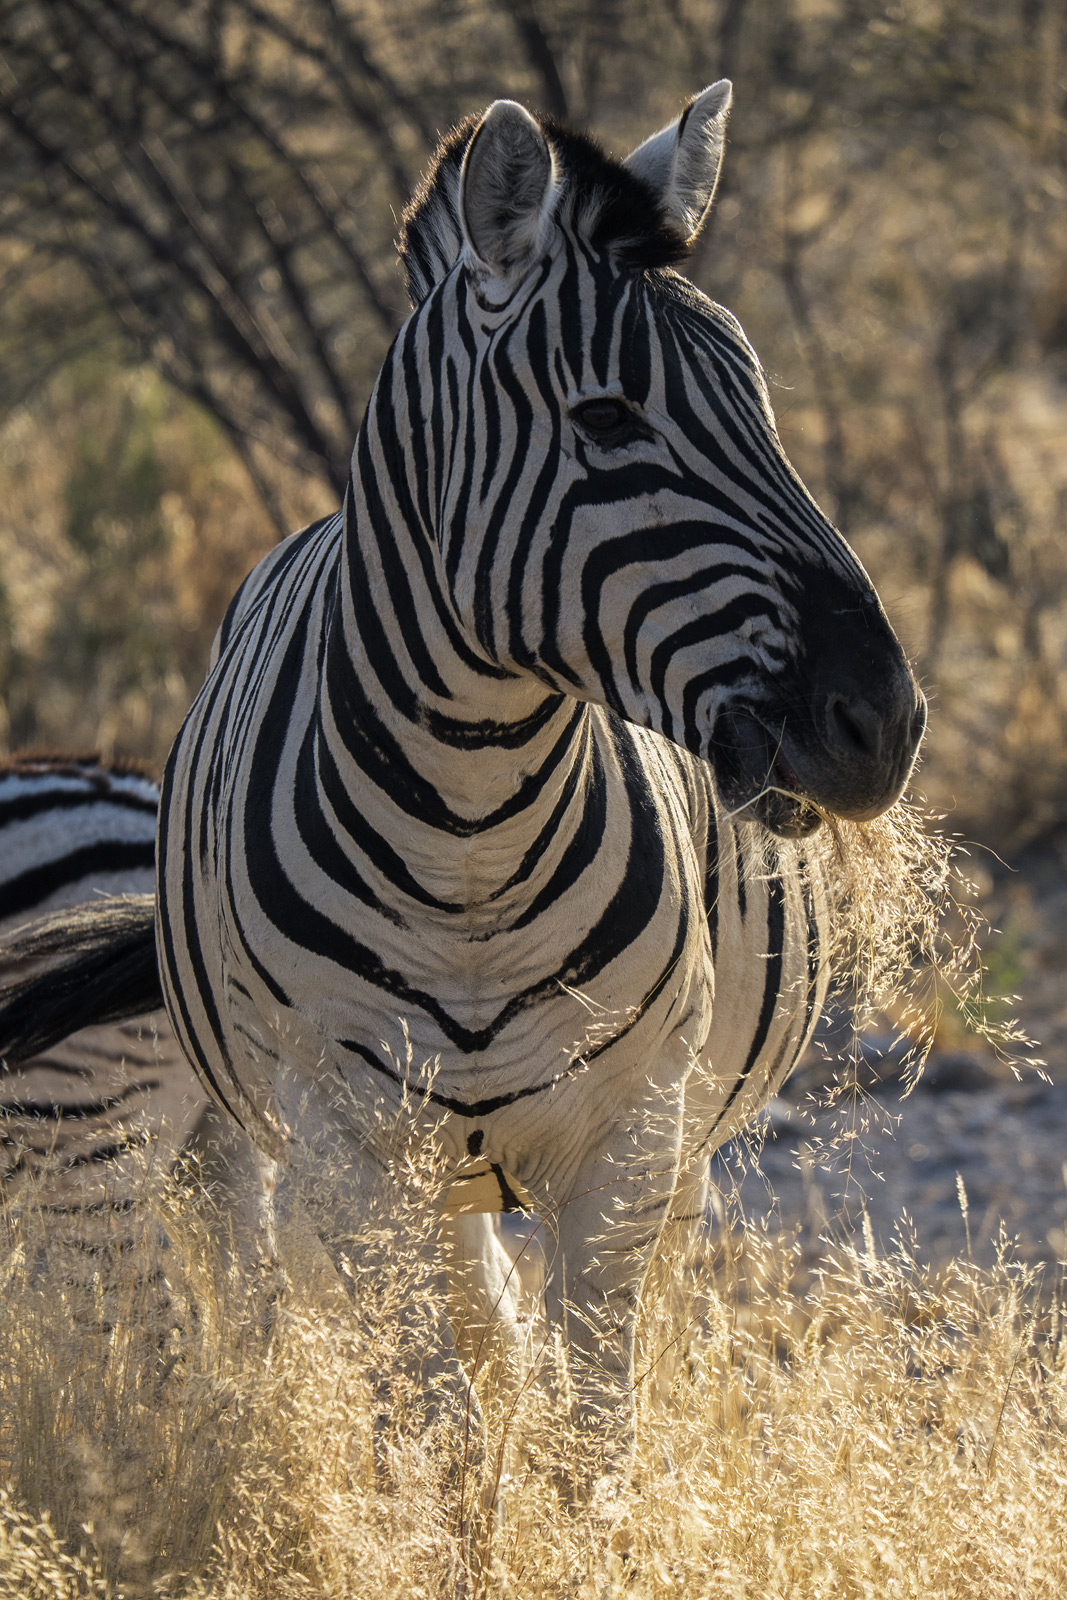 group, Zebra, gorgeous, roadside, sunrise, light, rim lighting, backlight, grass, un-concerned, head, ears, photo